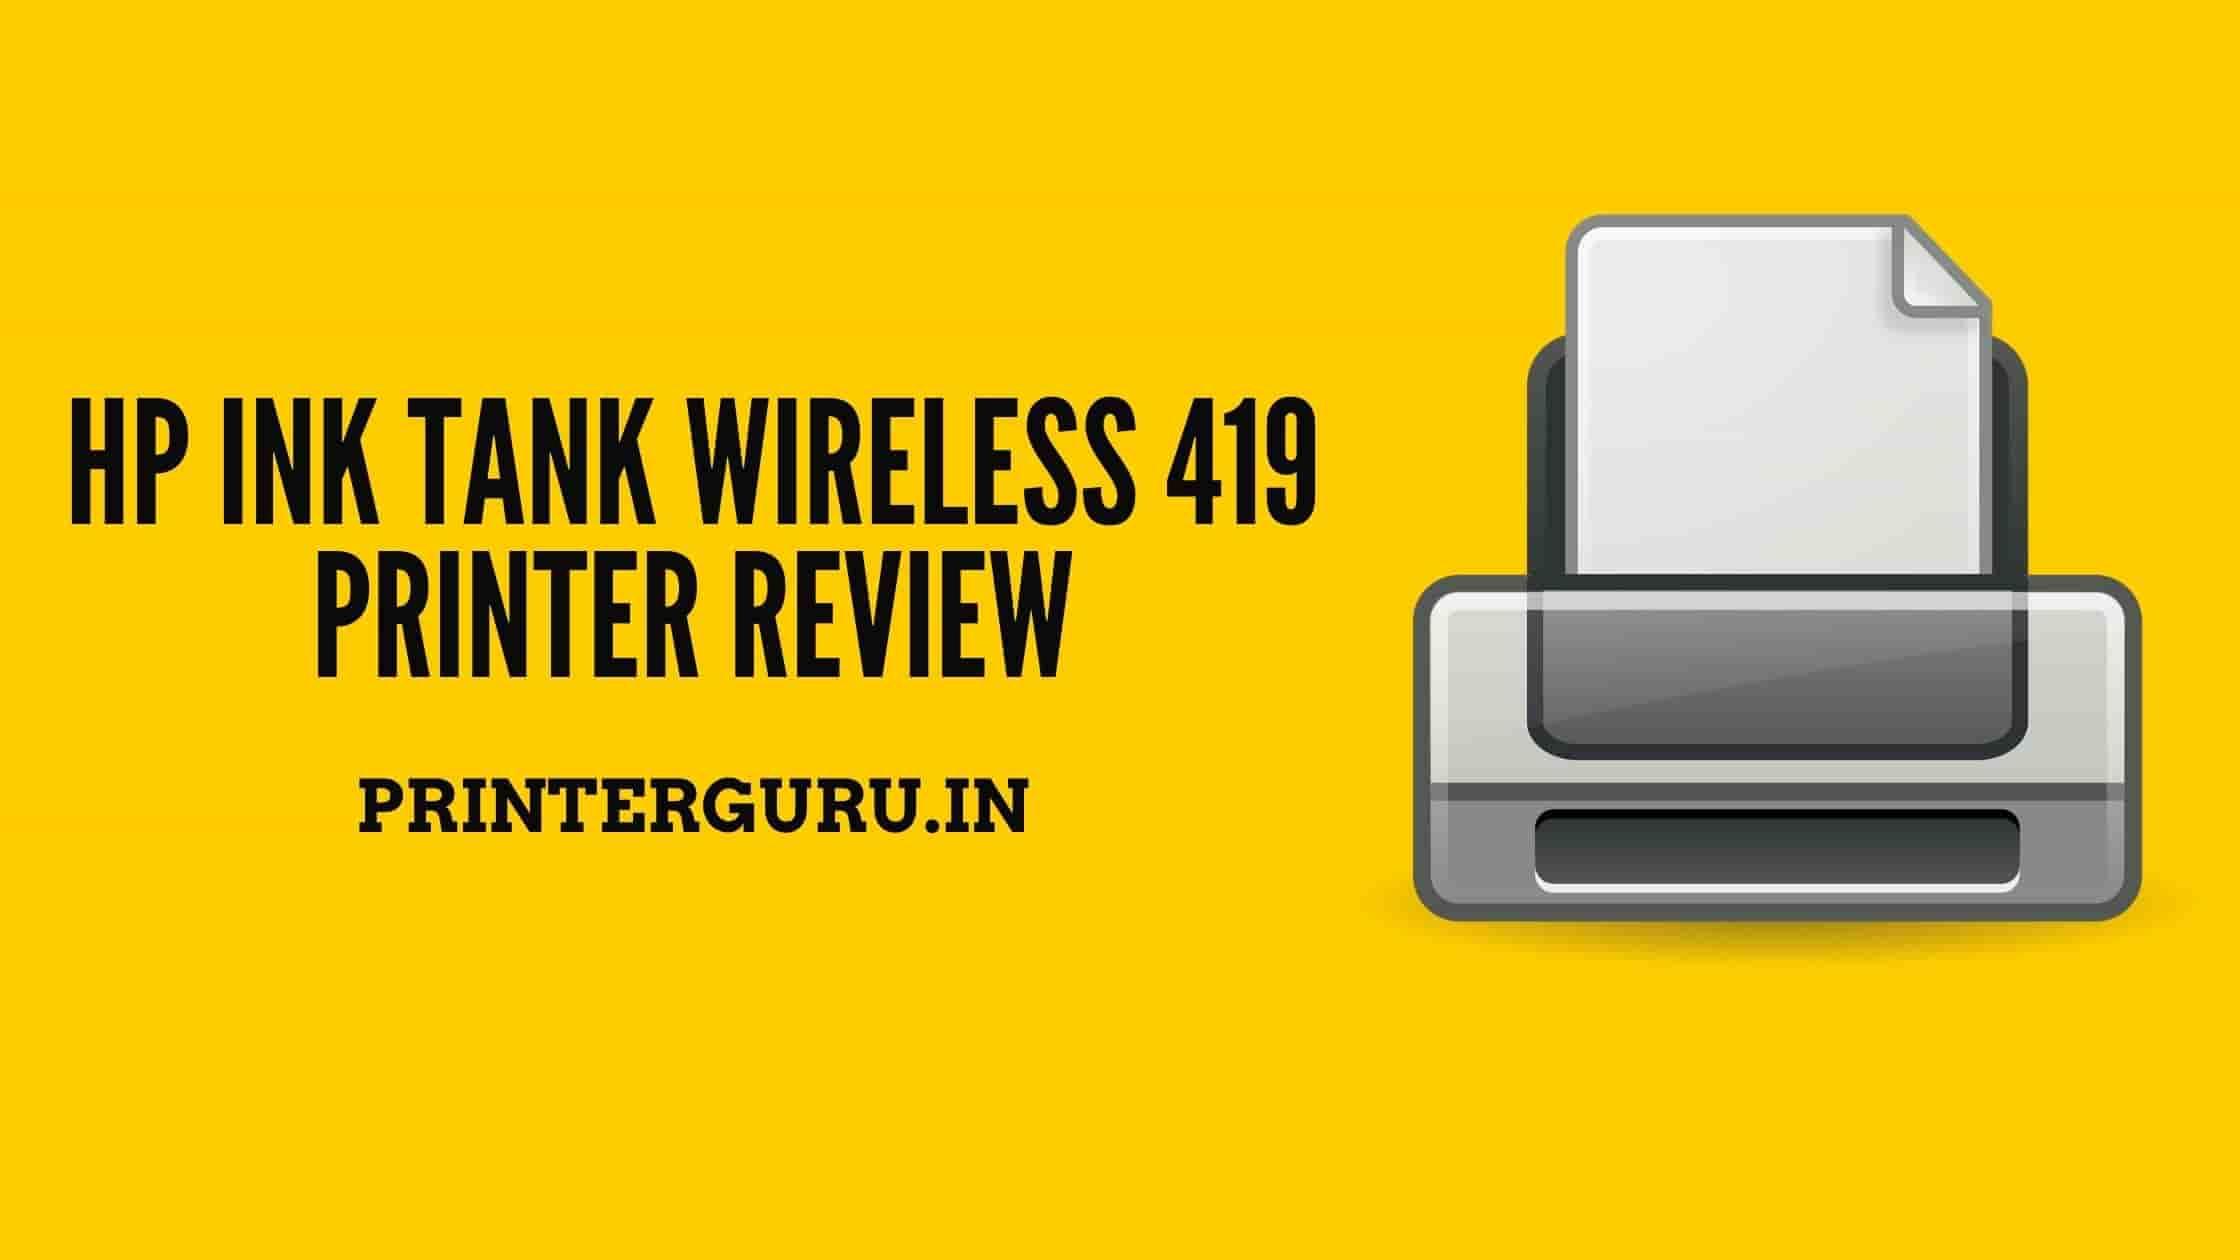 HP Ink Tank Wireless 419 Printer Review